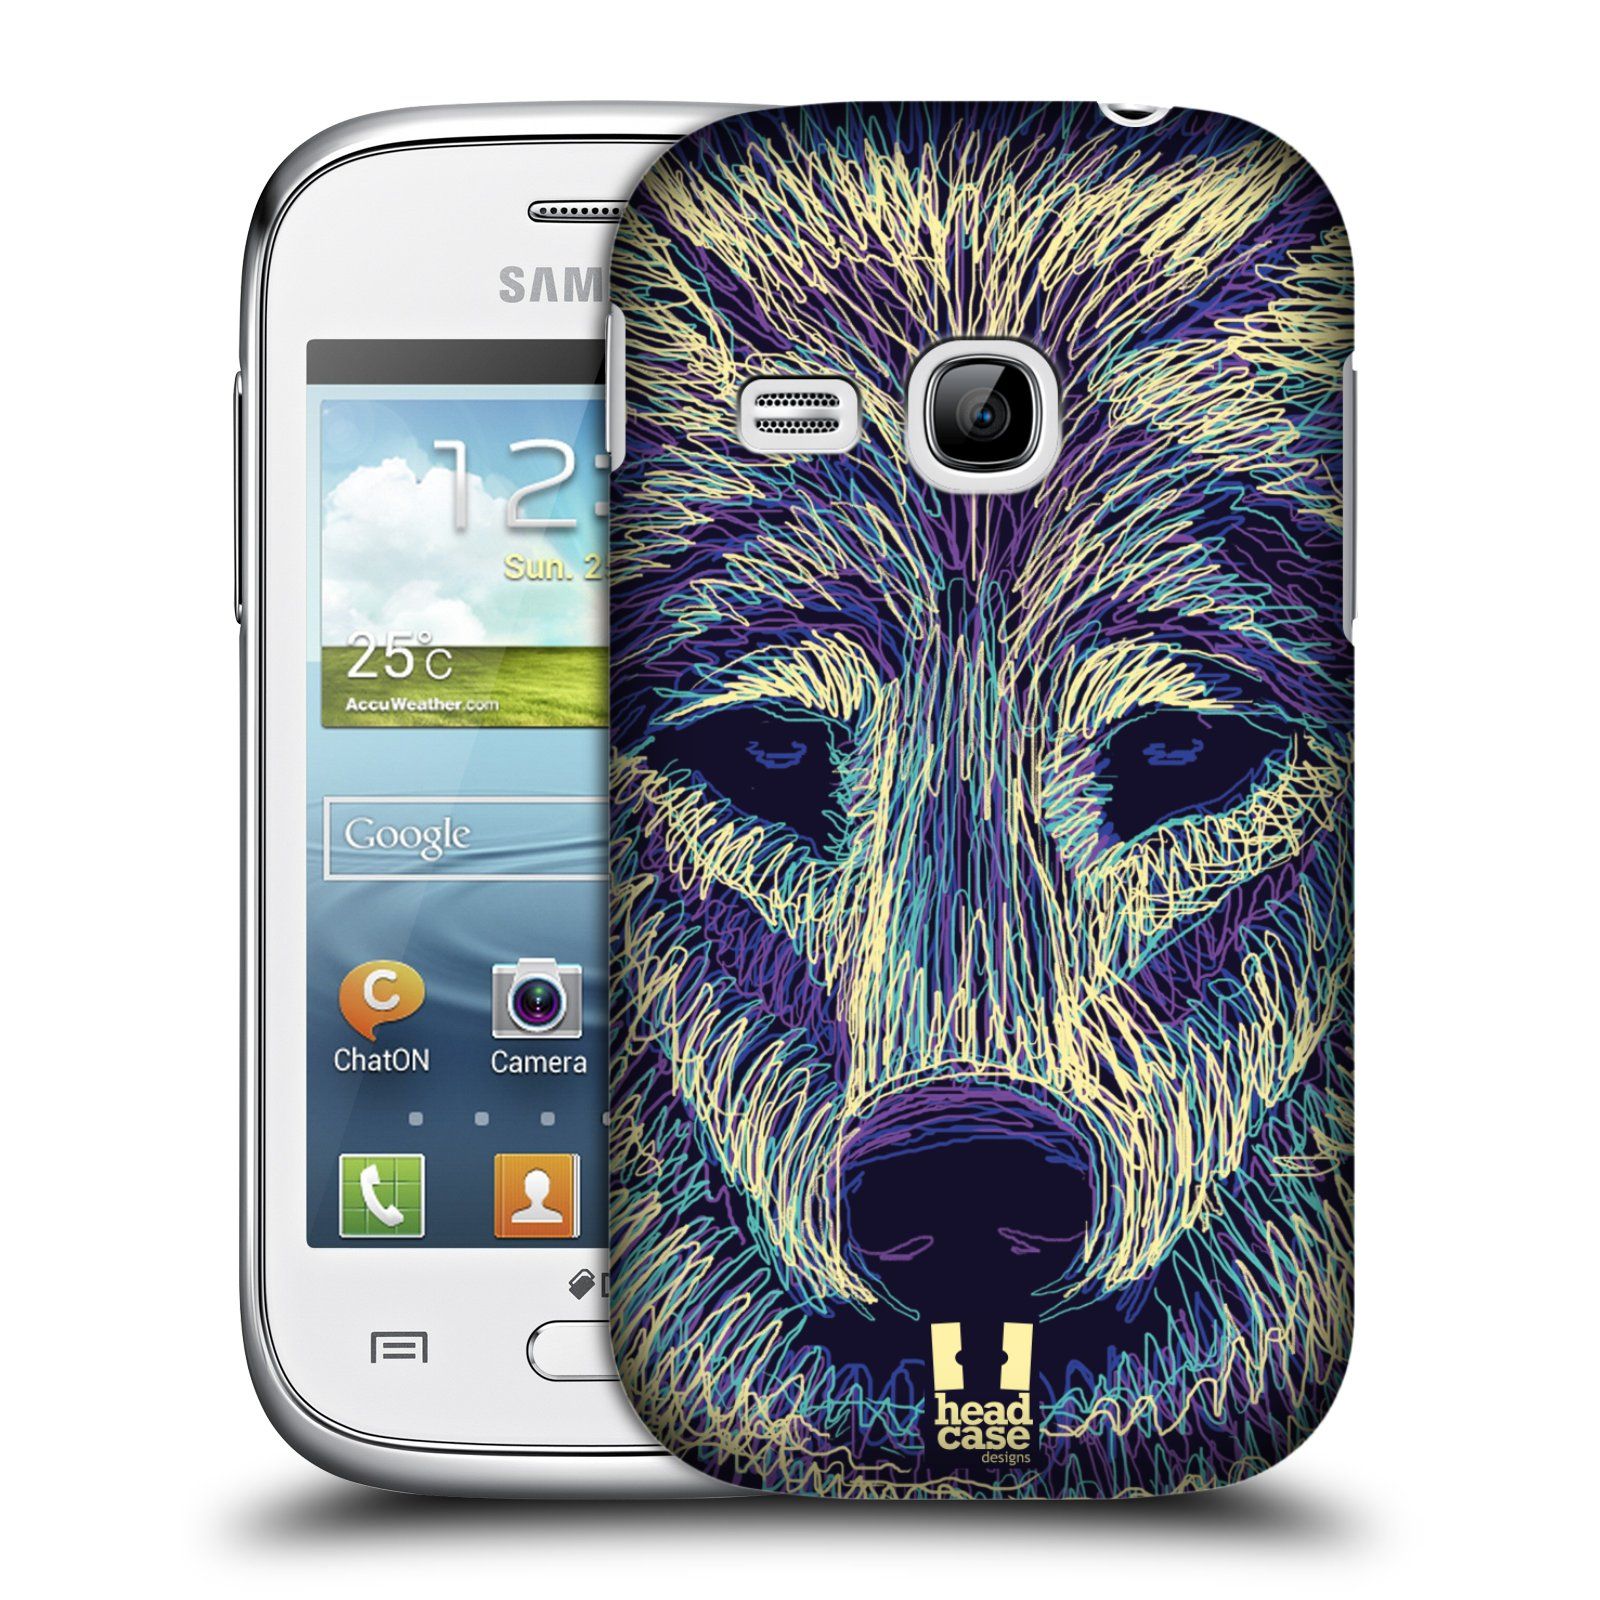 HEAD CASE plastový obal na mobil SAMSUNG Galaxy Young S6310 vzor zvíře čmáranice vlk